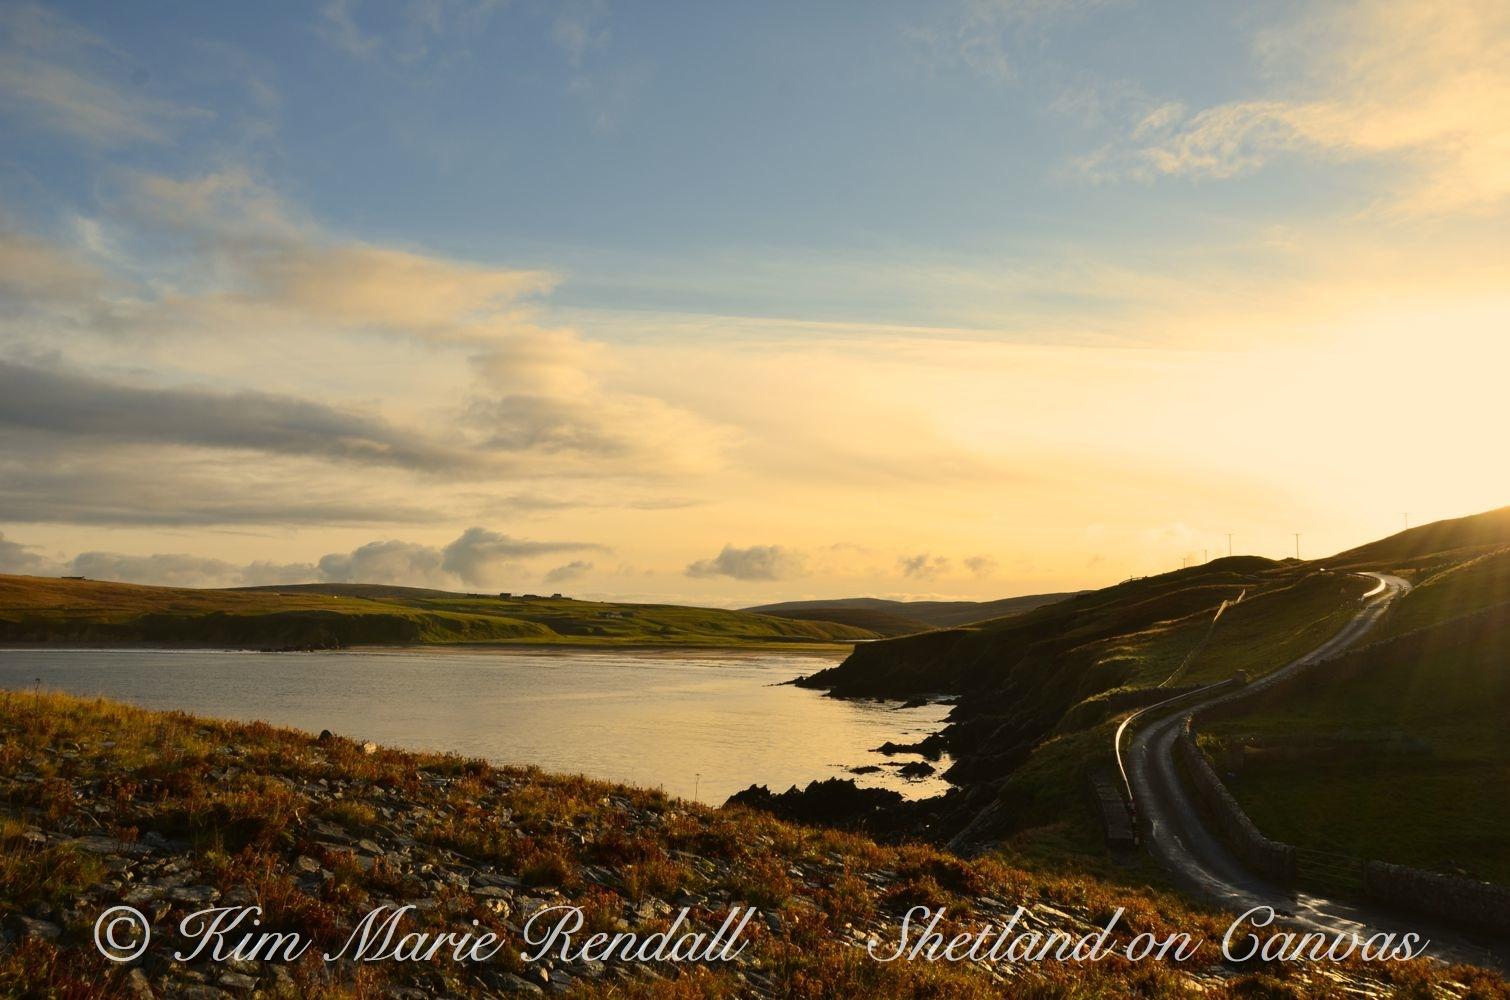 Evening Light at Burrafith, Unst